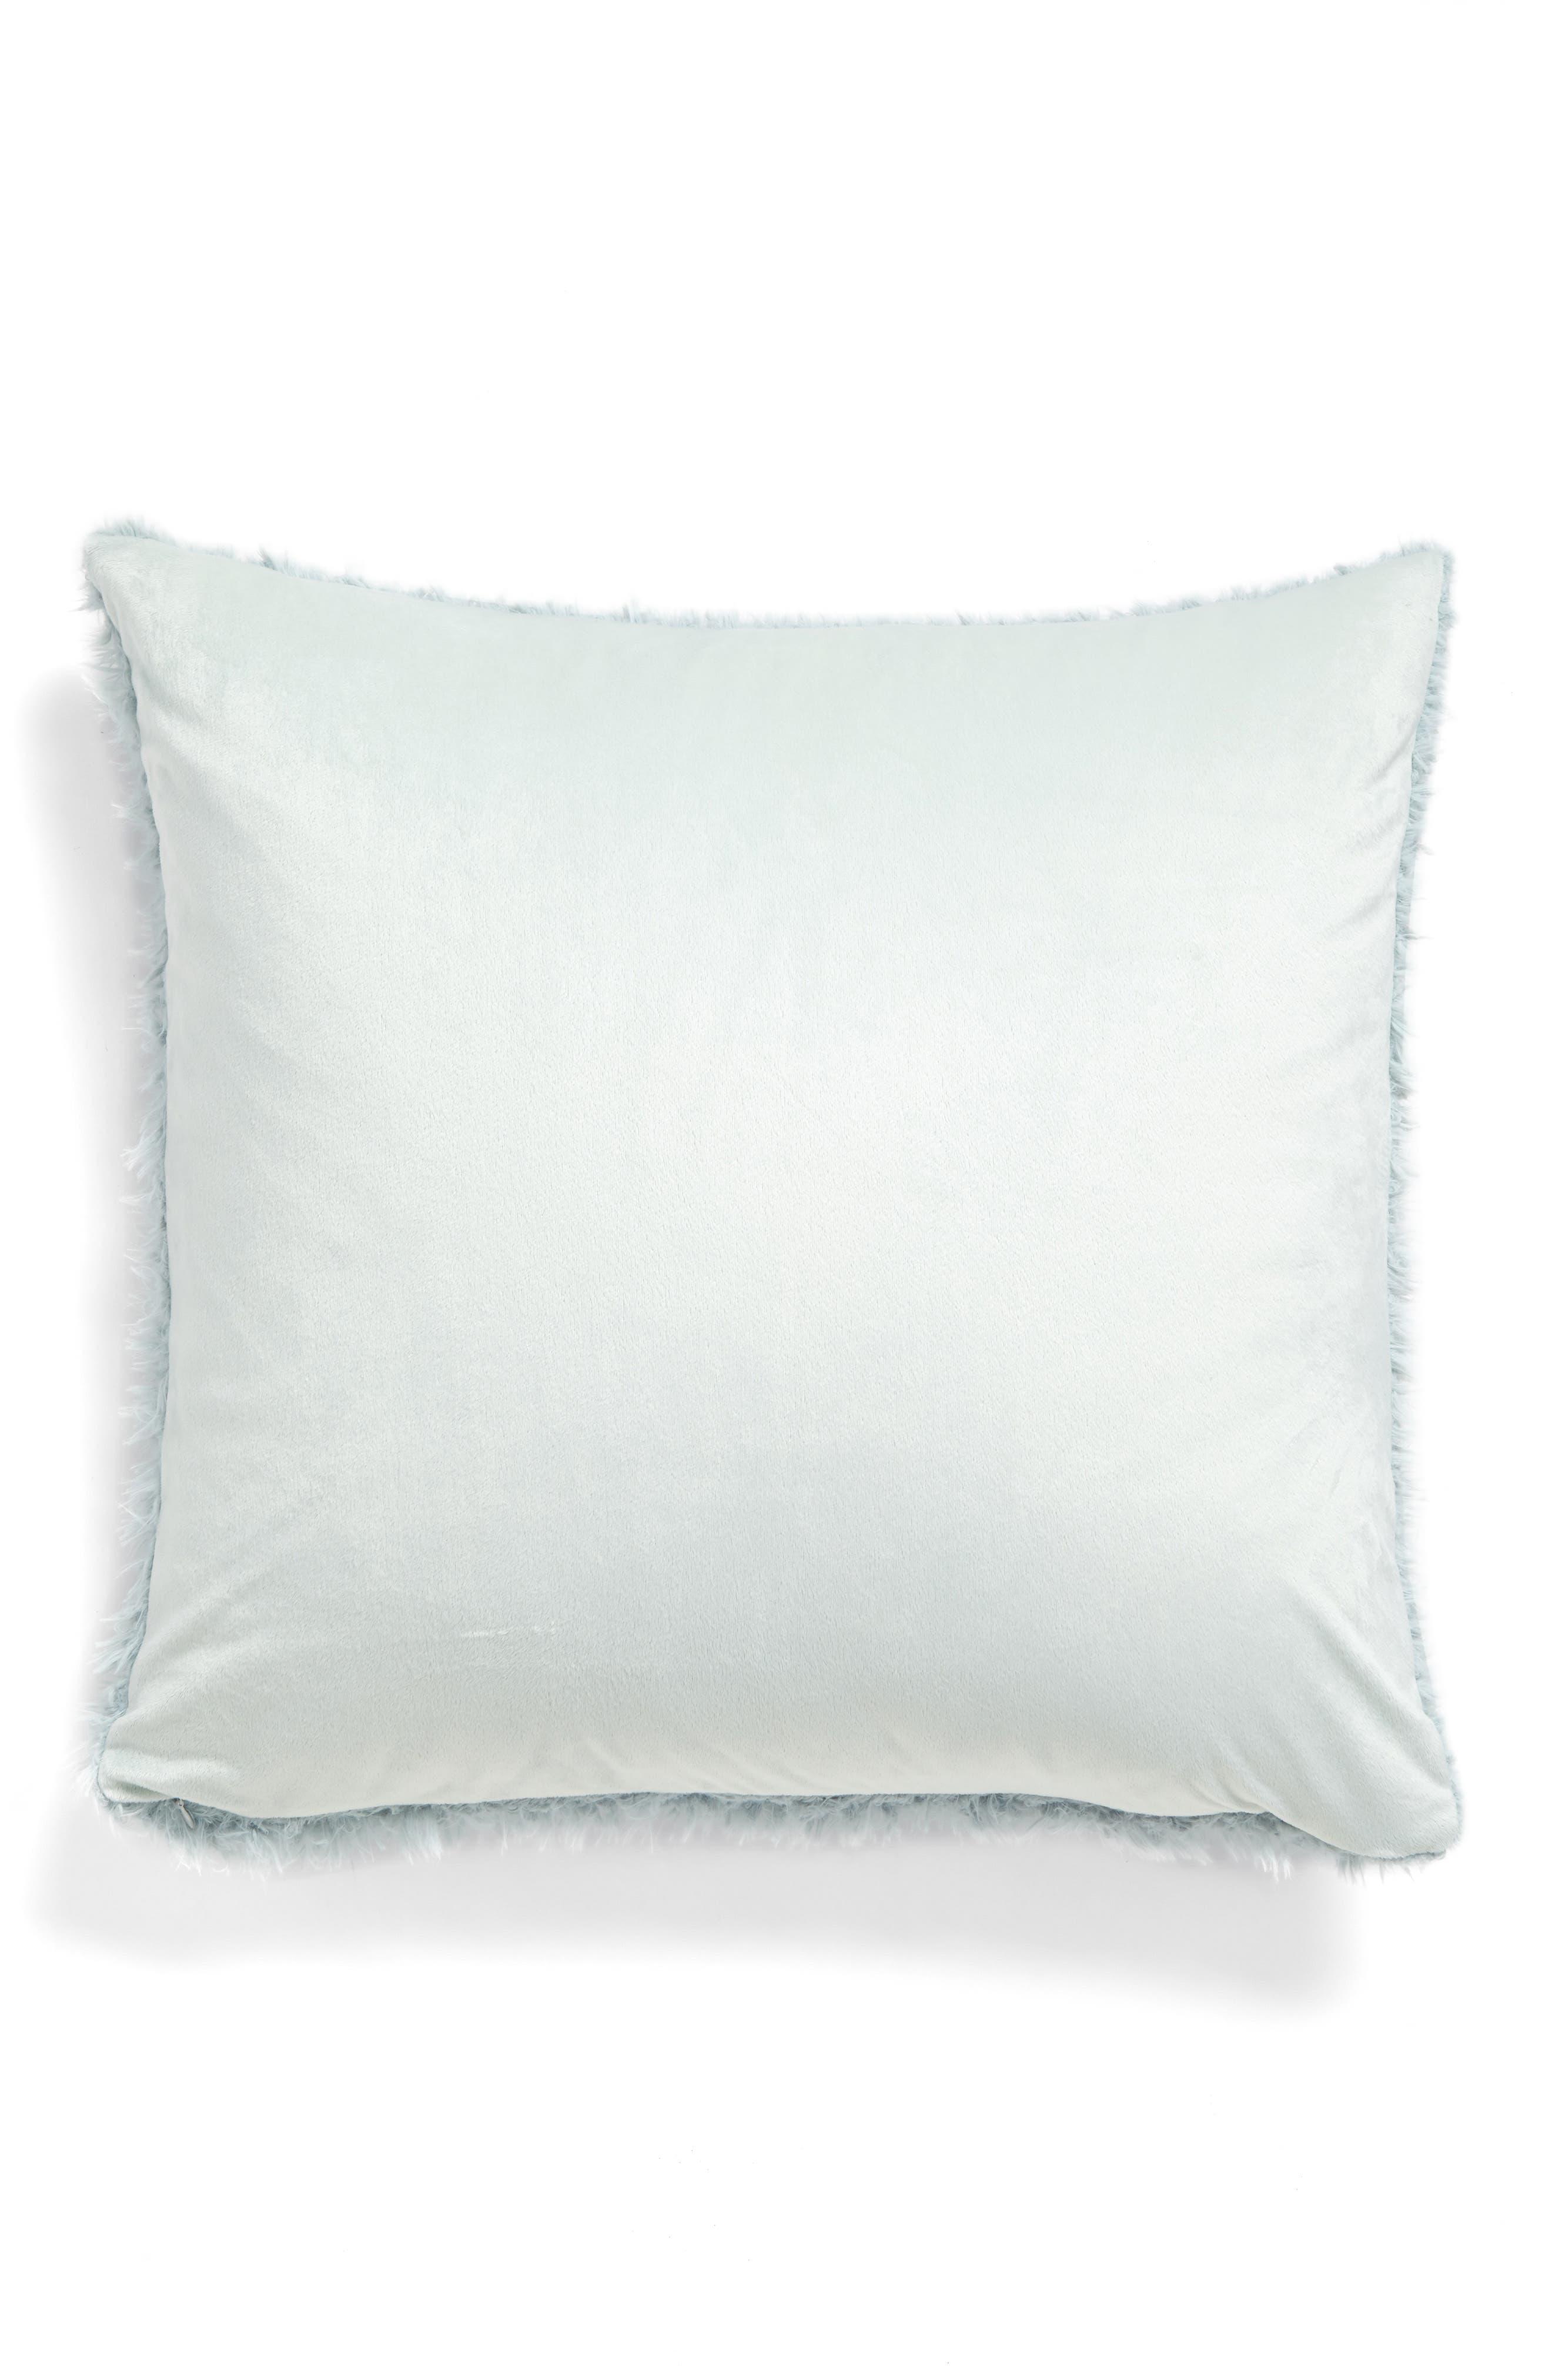 Shaggy Plush Pillow,                             Alternate thumbnail 2, color,                             Green Soft